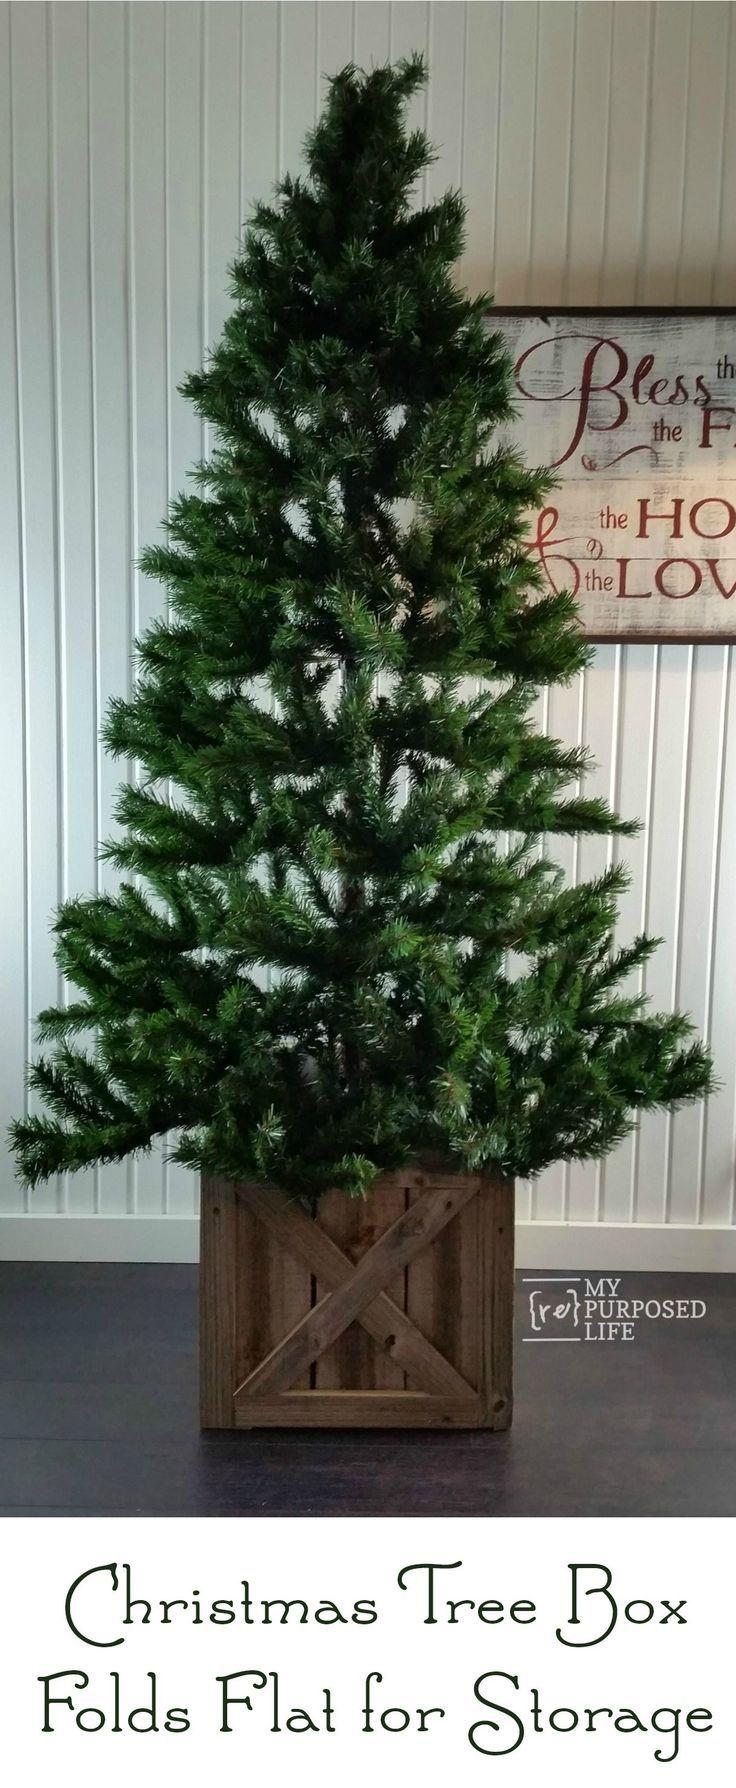 Christmas Tree Stand Box Folds Flat For Storage Myrepurposedlife